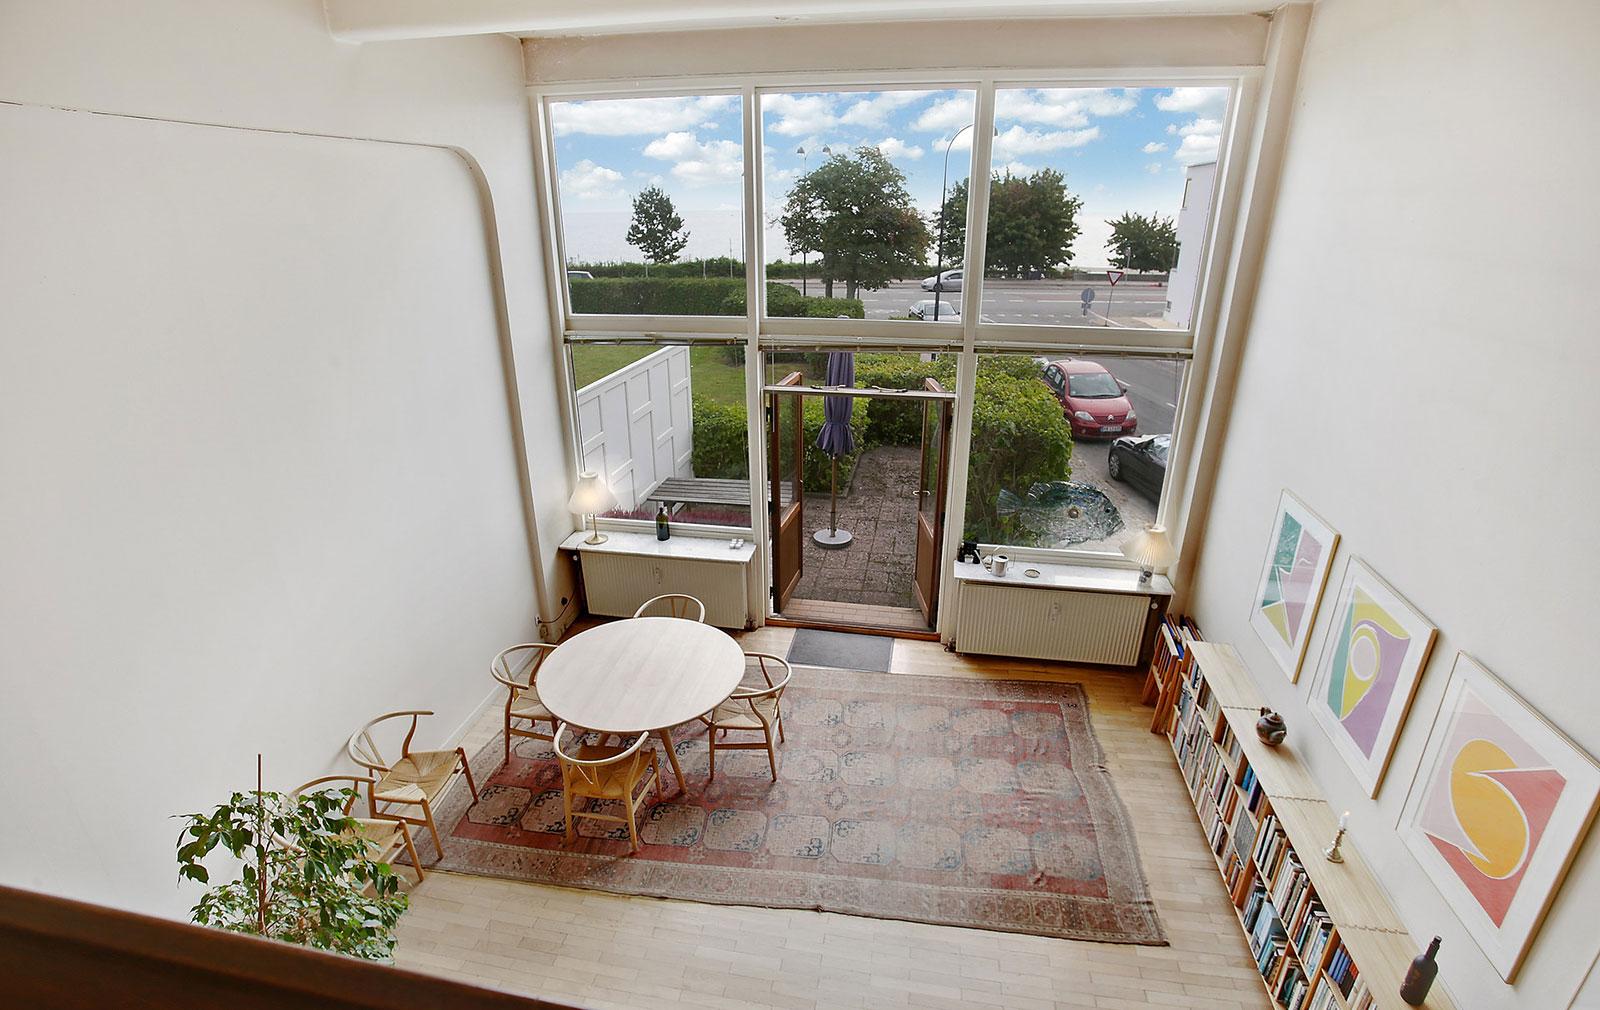 Copenhagen home designed by Arne Jacobsen inside Bellevue Teatret